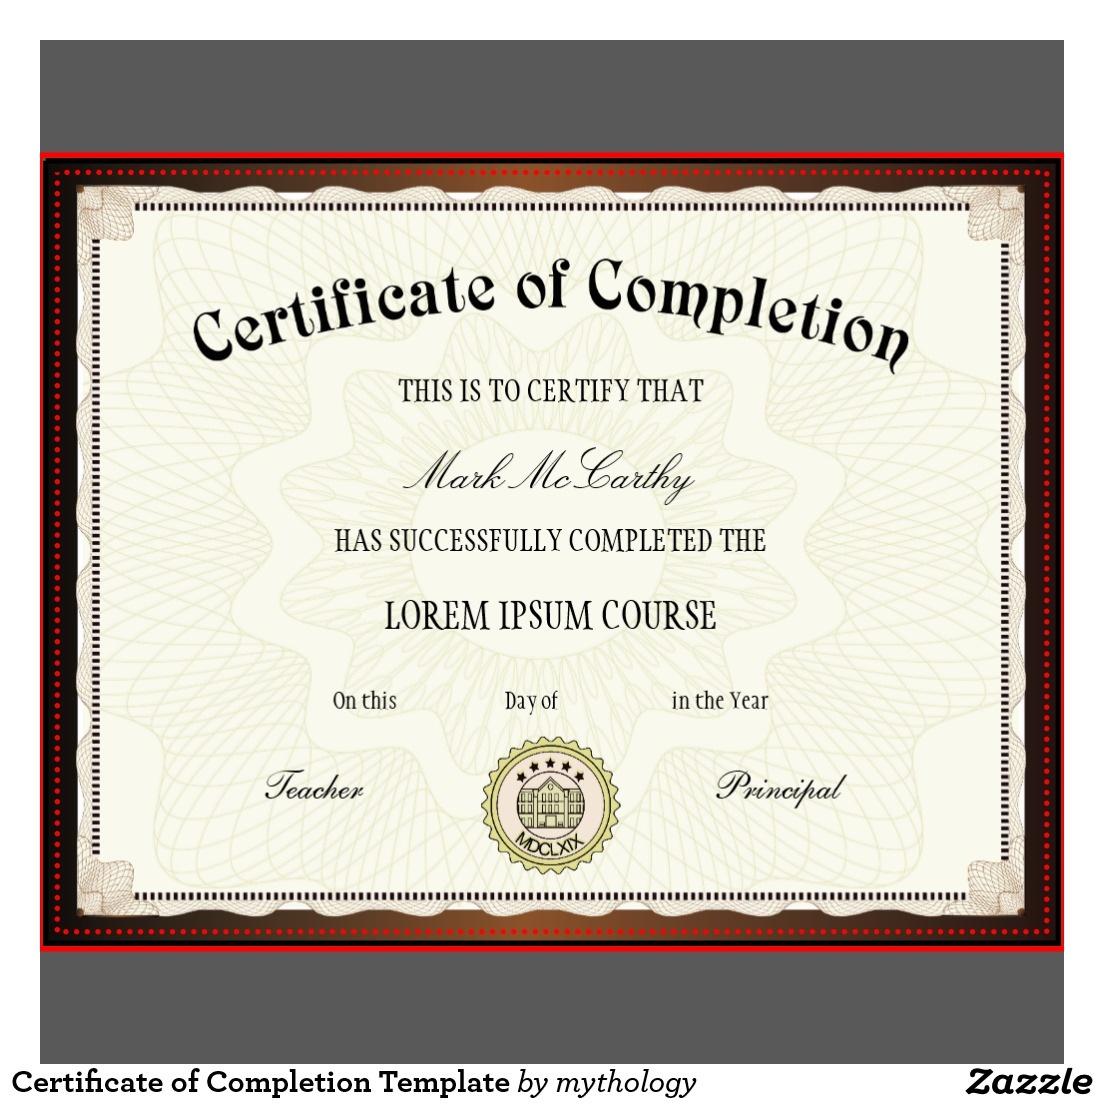 Free Printable Certificates | Certificate Templates - Certificate Of Completion Template Free Printable